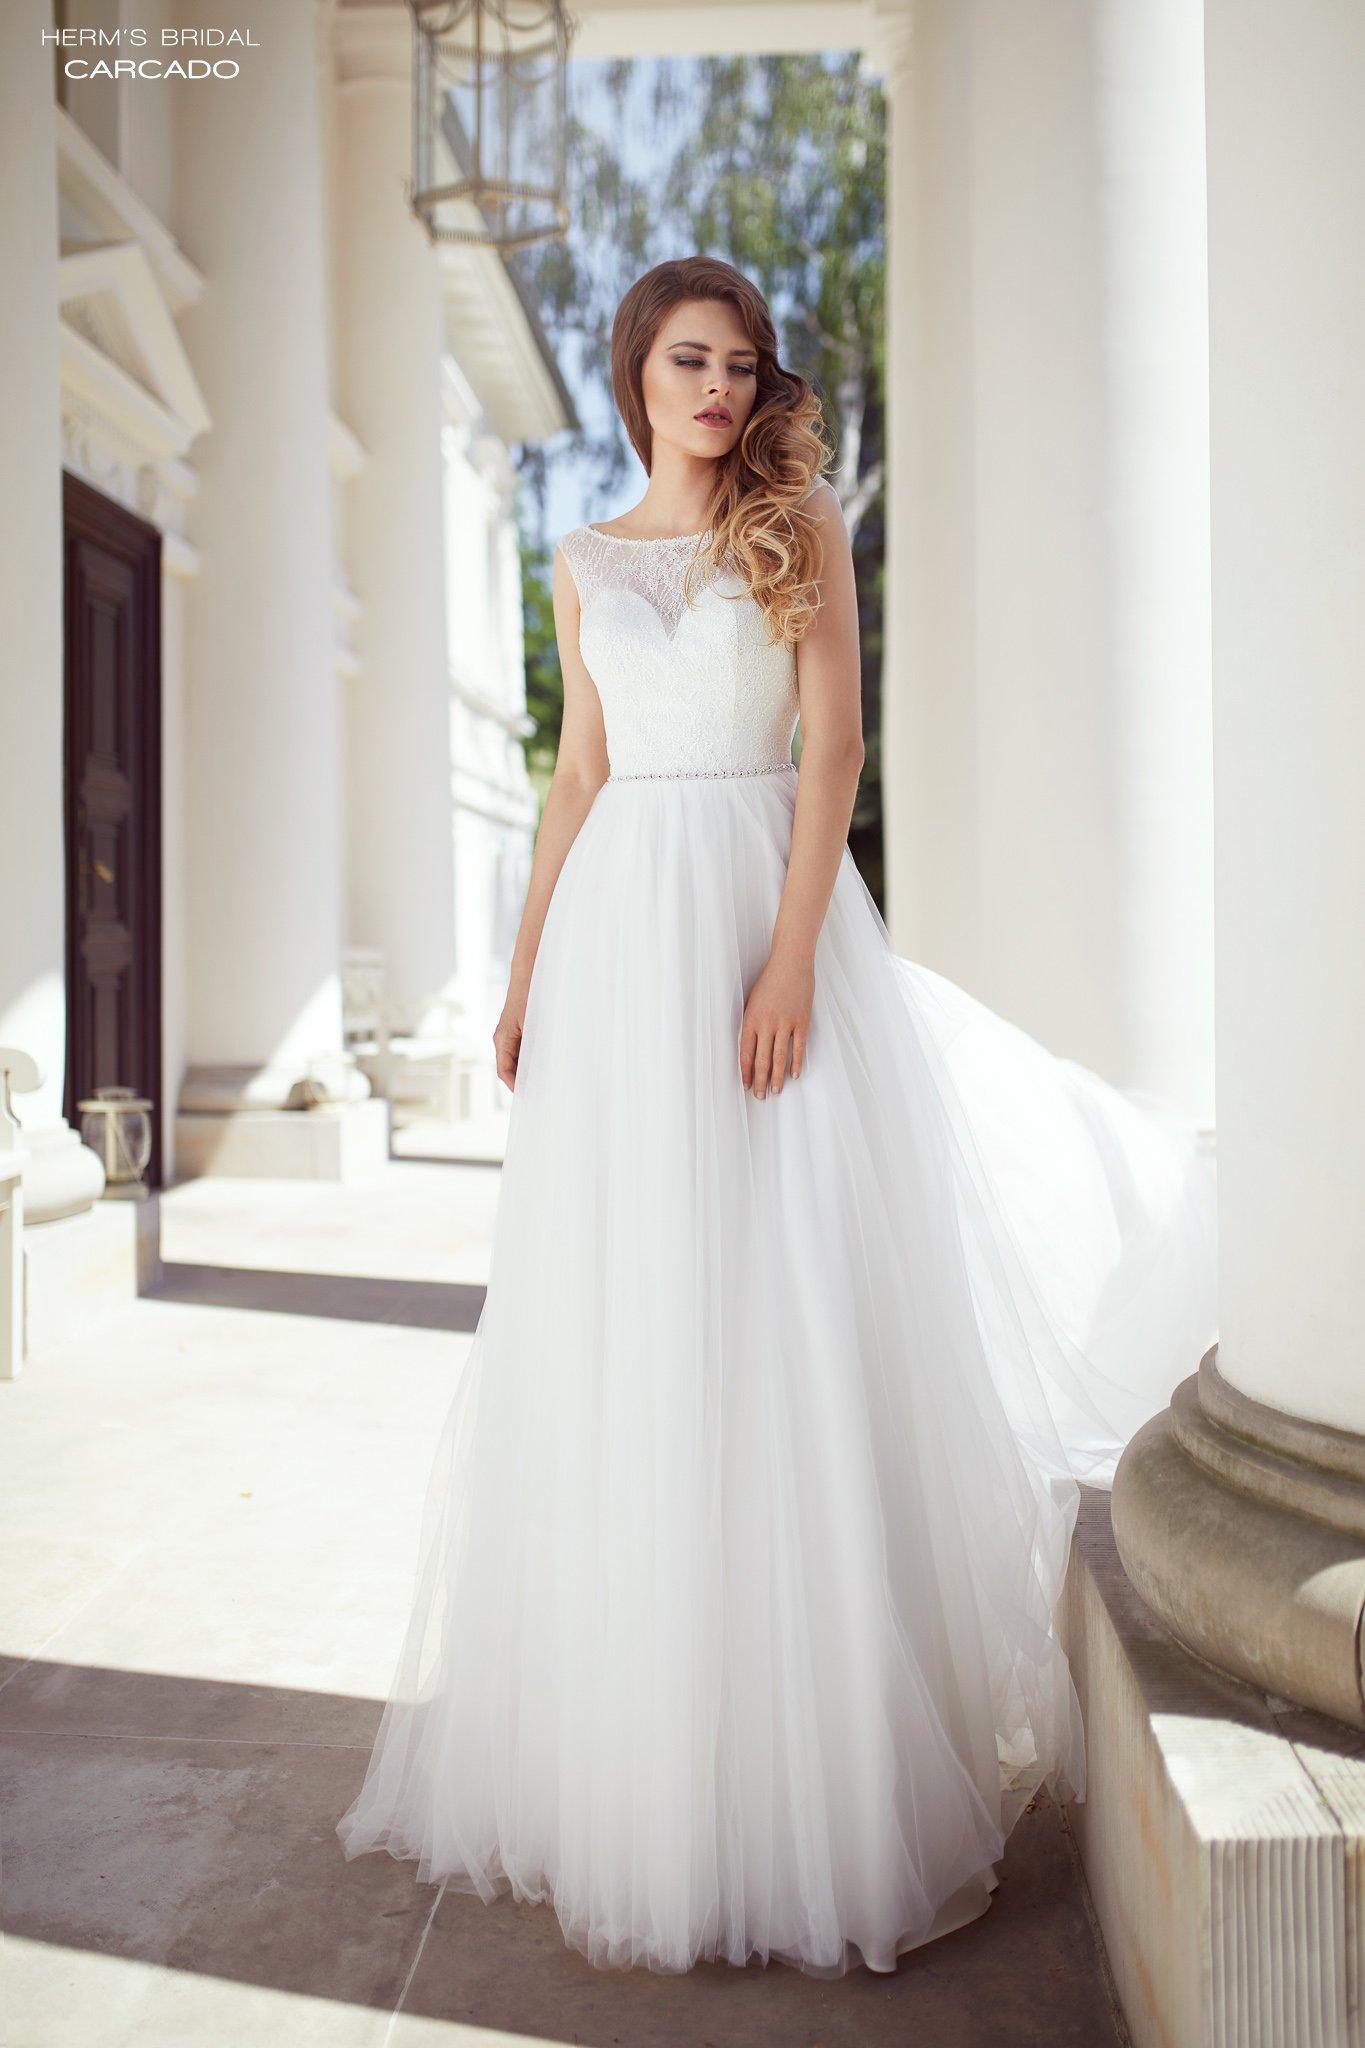 La Novia Brautmoden Euer Brautmodengeschft in Weiden id